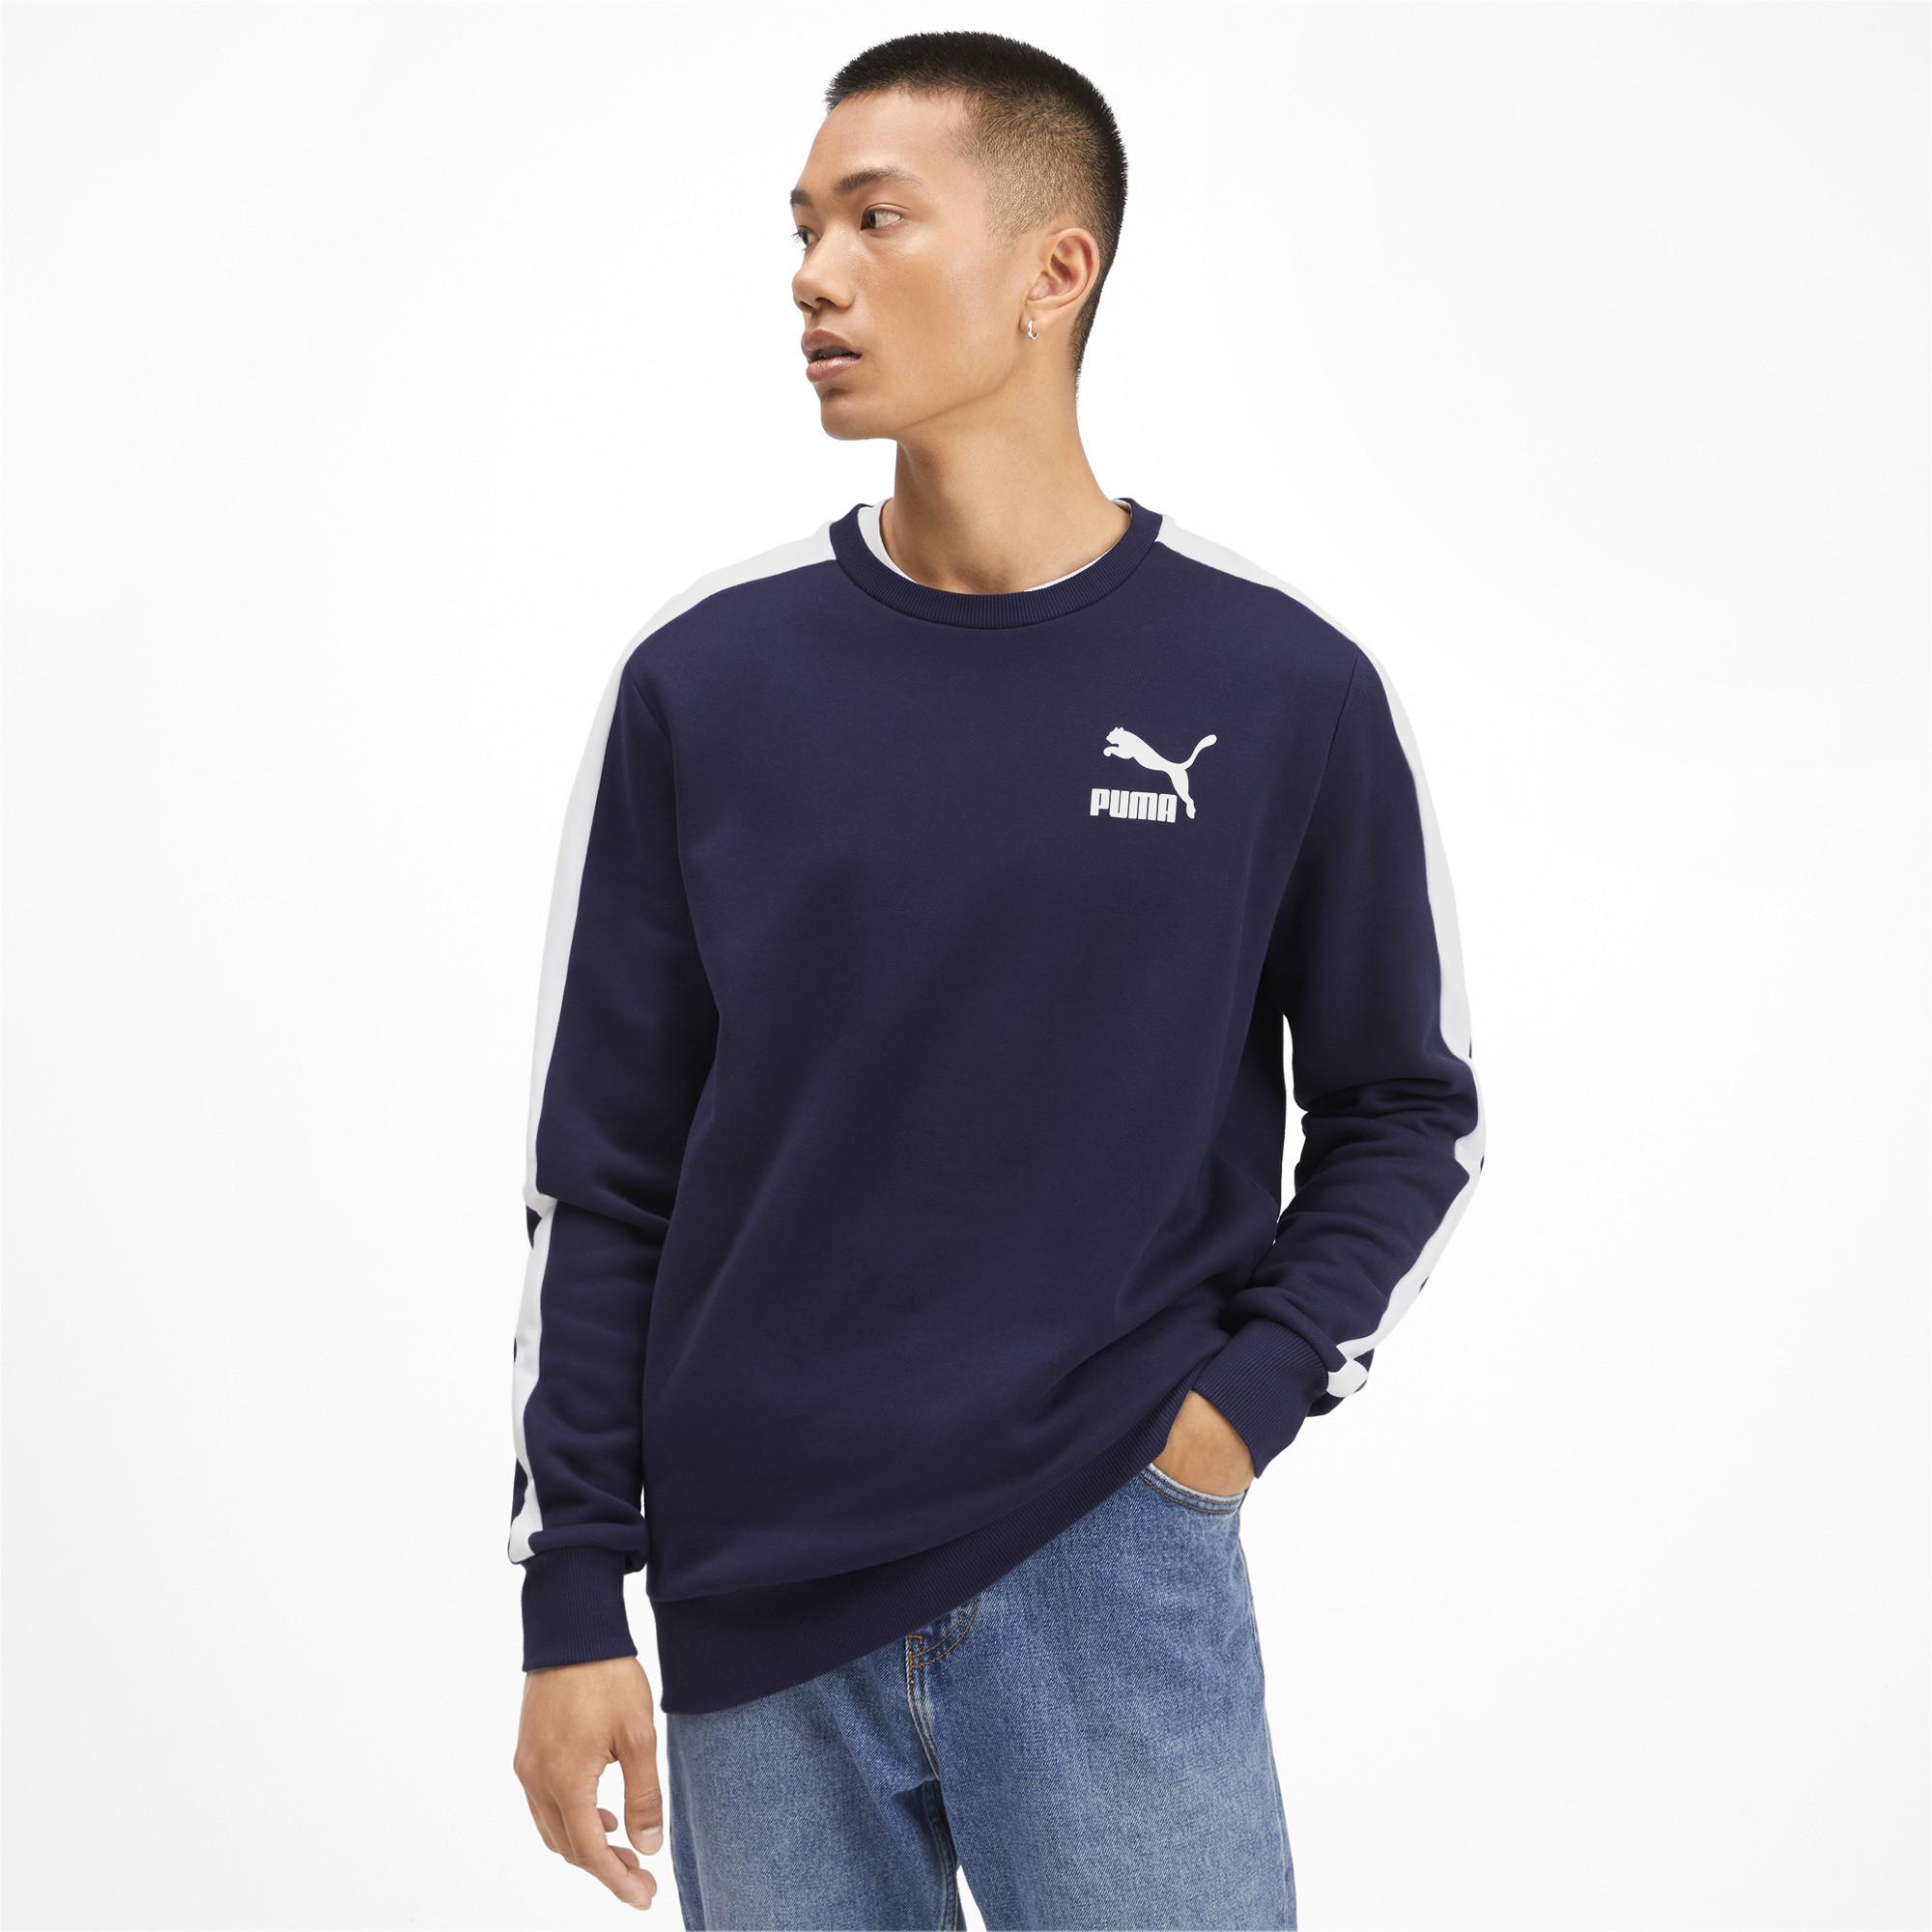 PUMA-Iconic-T7-Men-039-s-Fleece-Crewneck-Sweatshirt-Men-Sweat-Sport-Classics thumbnail 4